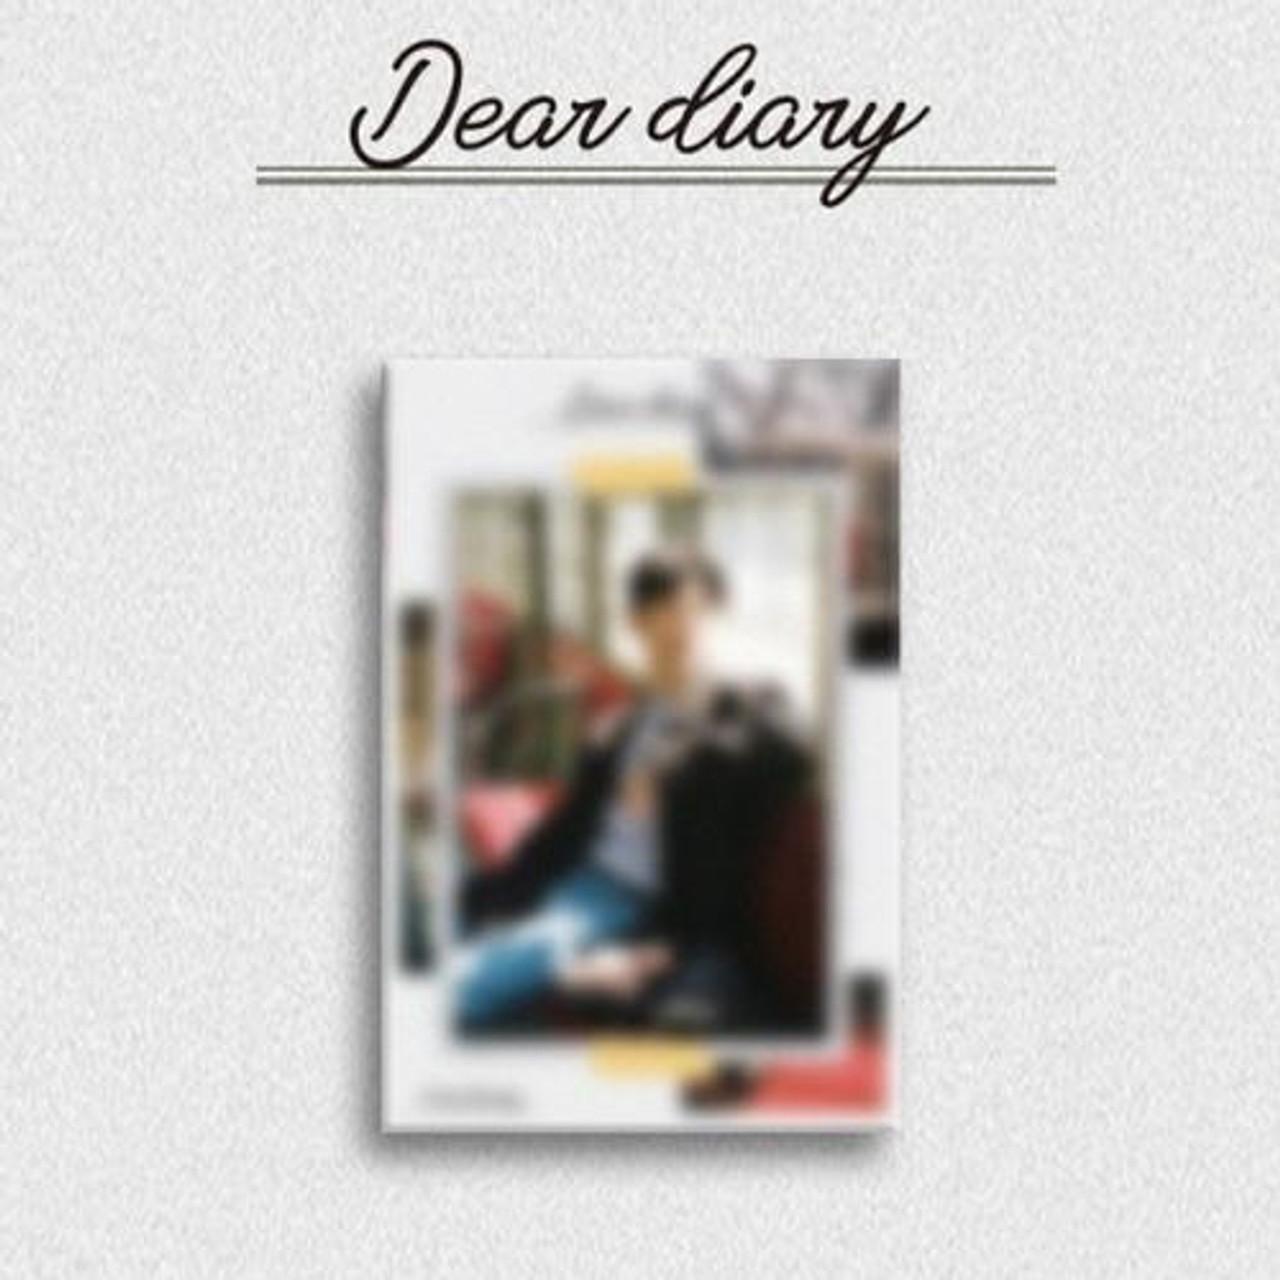 YOON JI SUNG - Special Album [Dear diary] (Kihno Album - DHL Shipping Only)